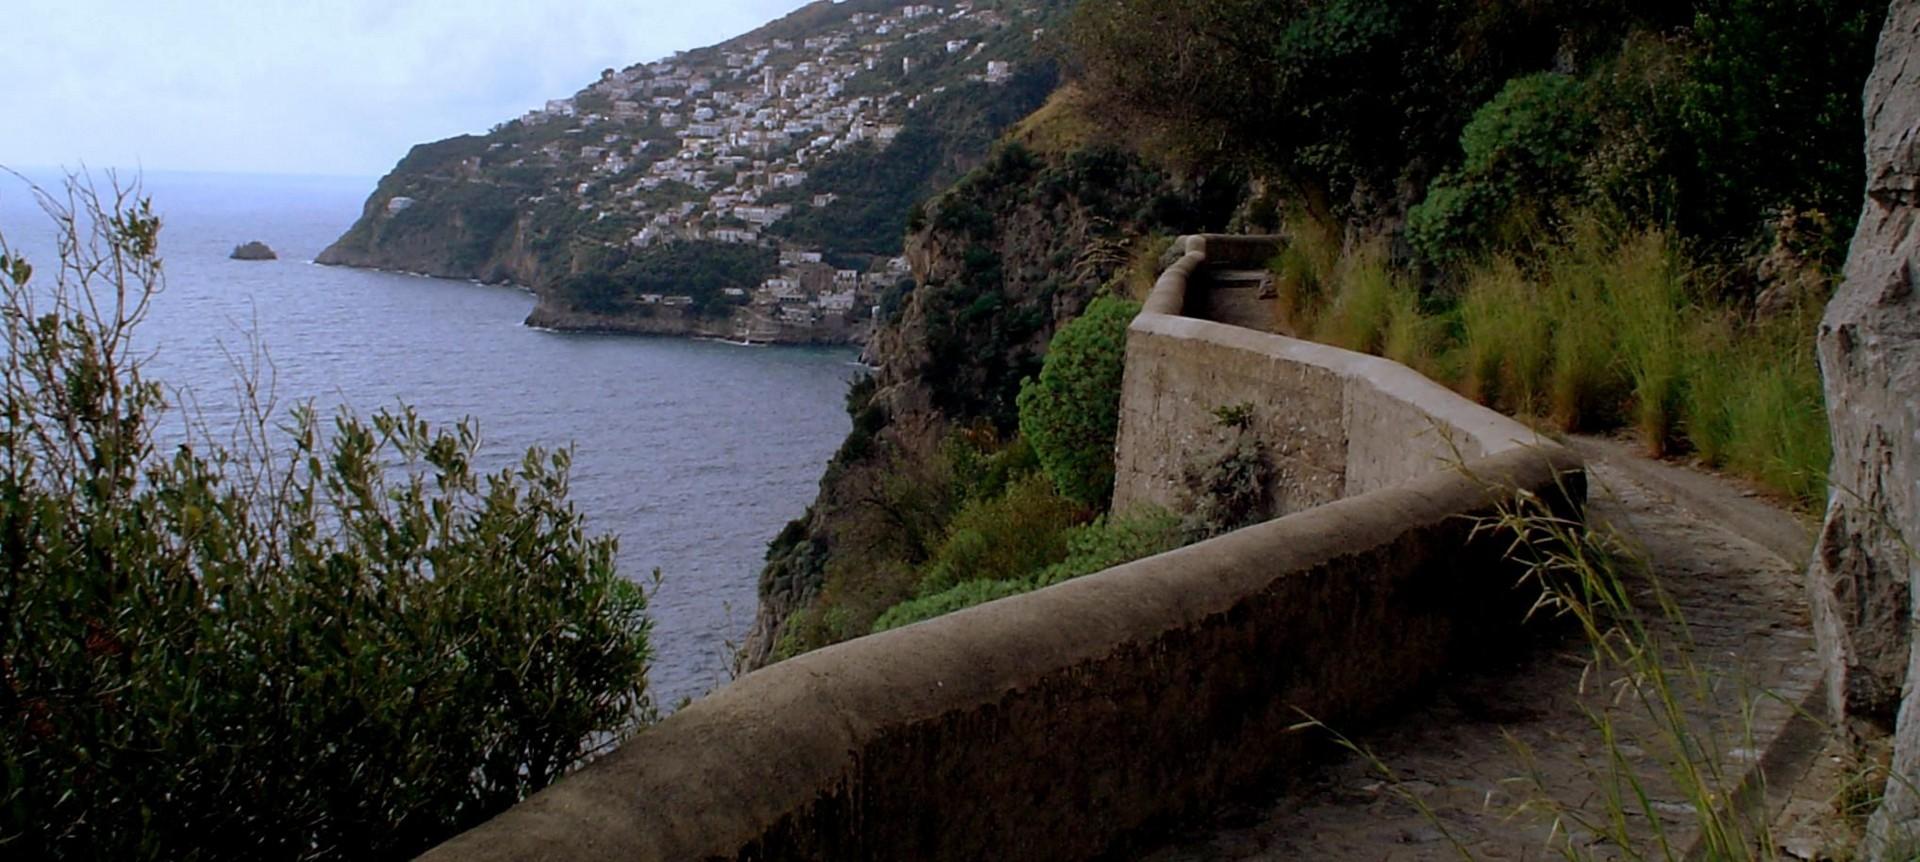 Amalfi11.jpg - Italy - Amalfi Coast Walking - Guided Holiday - Walking